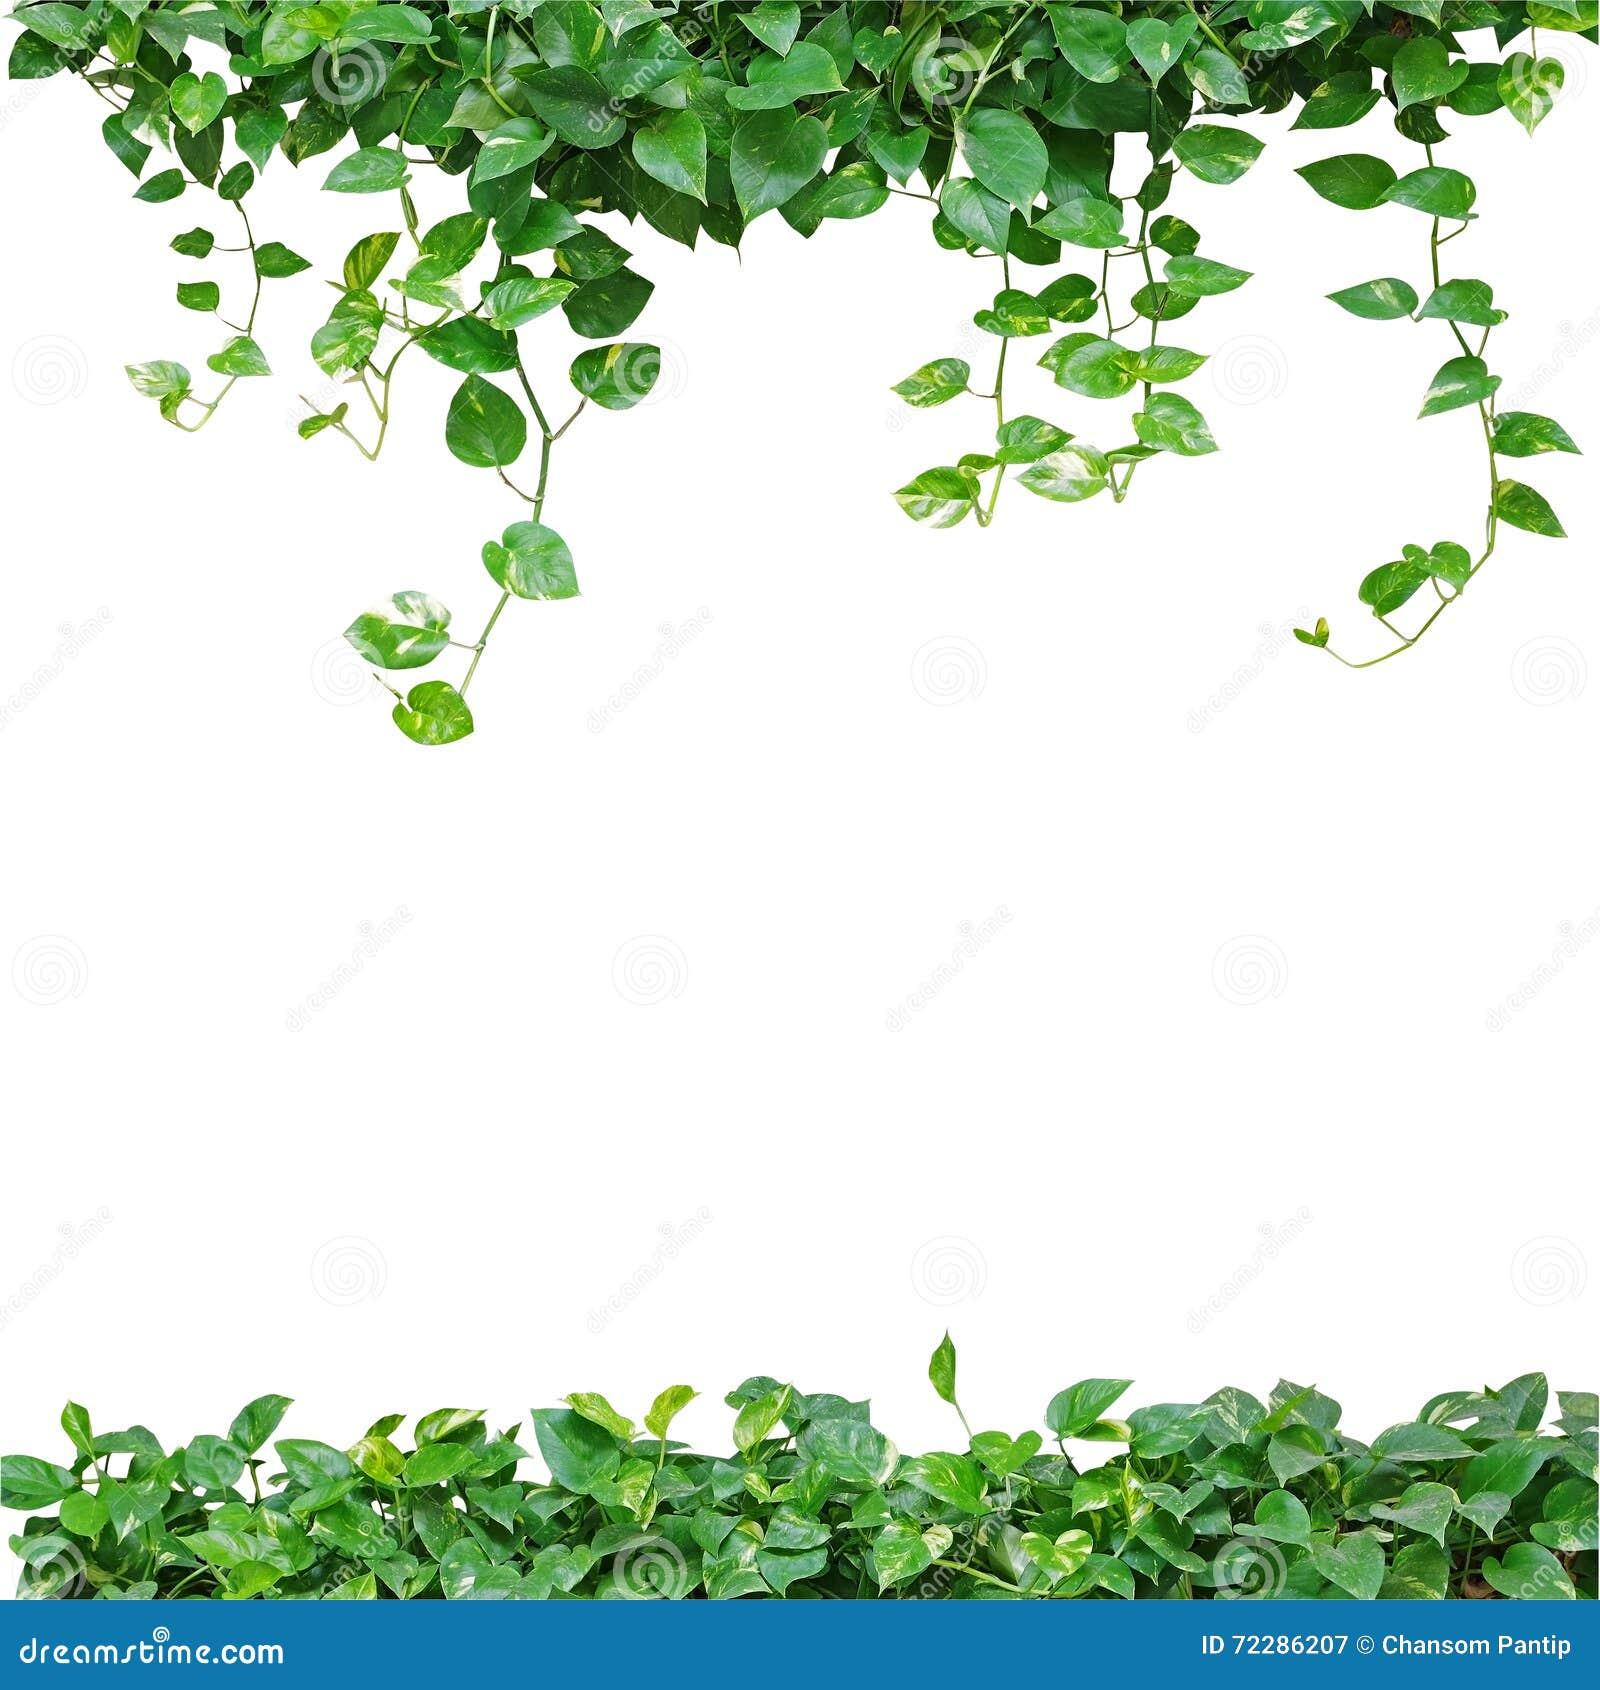 Heart shaped leaves vine devils ivy golden pothos isolated o heart shaped leaves vine devils ivy golden pothos isolated o royalty free stock image cartoondealer 74453620 mightylinksfo